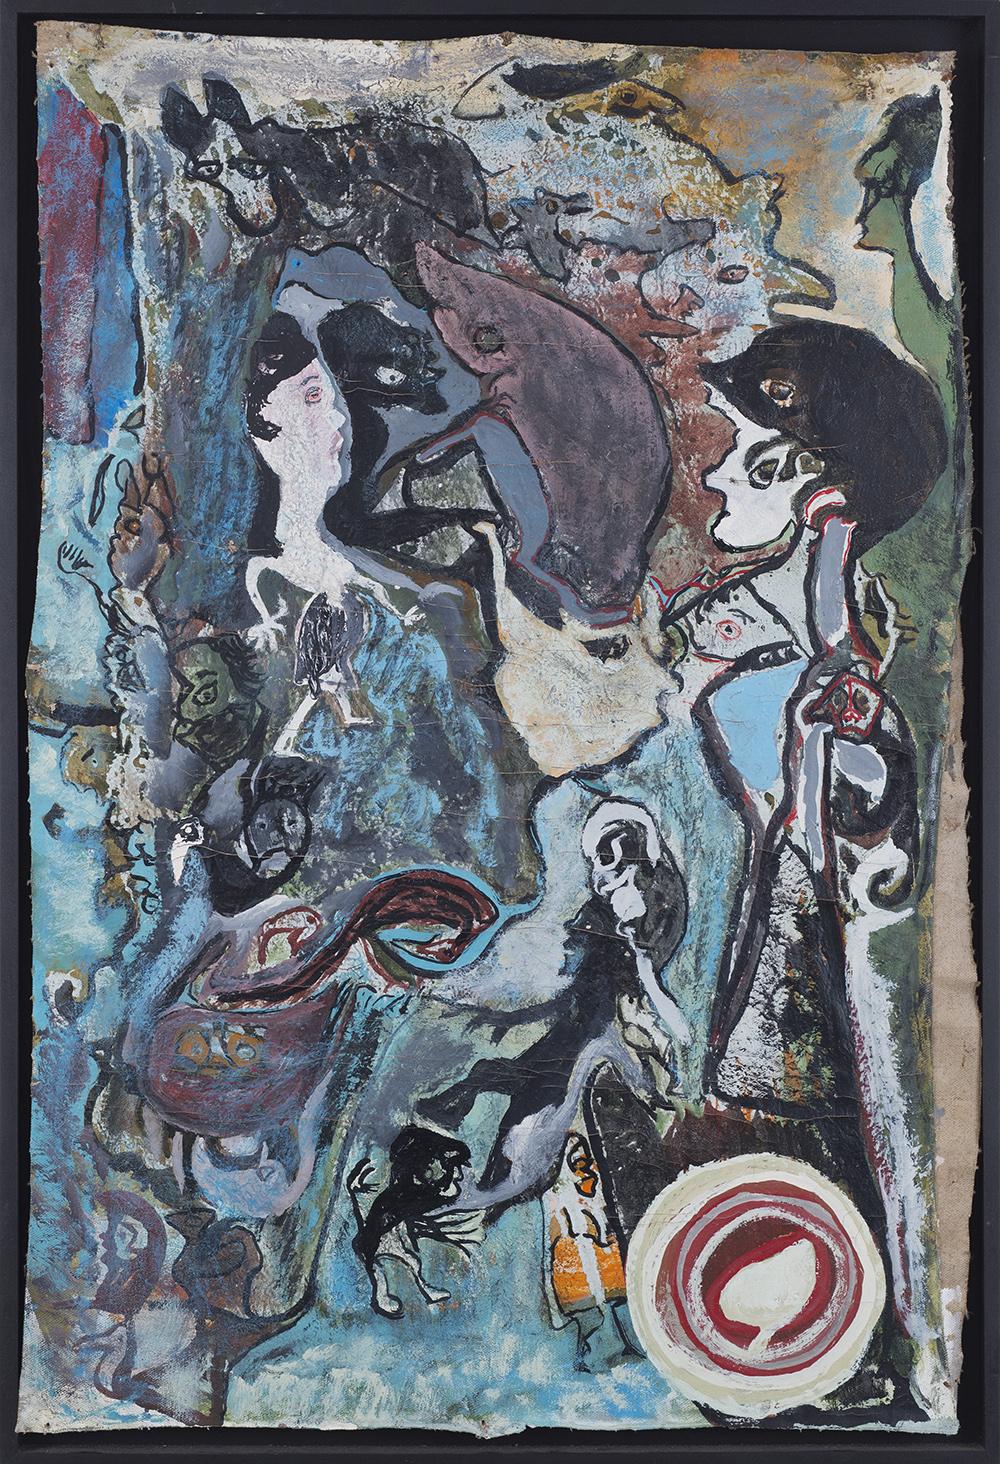 Leonard Daley Helmet, 1991 Oil on canvas 26.5 x 17.5 inches 67.3 x 44.5 cm LE 33